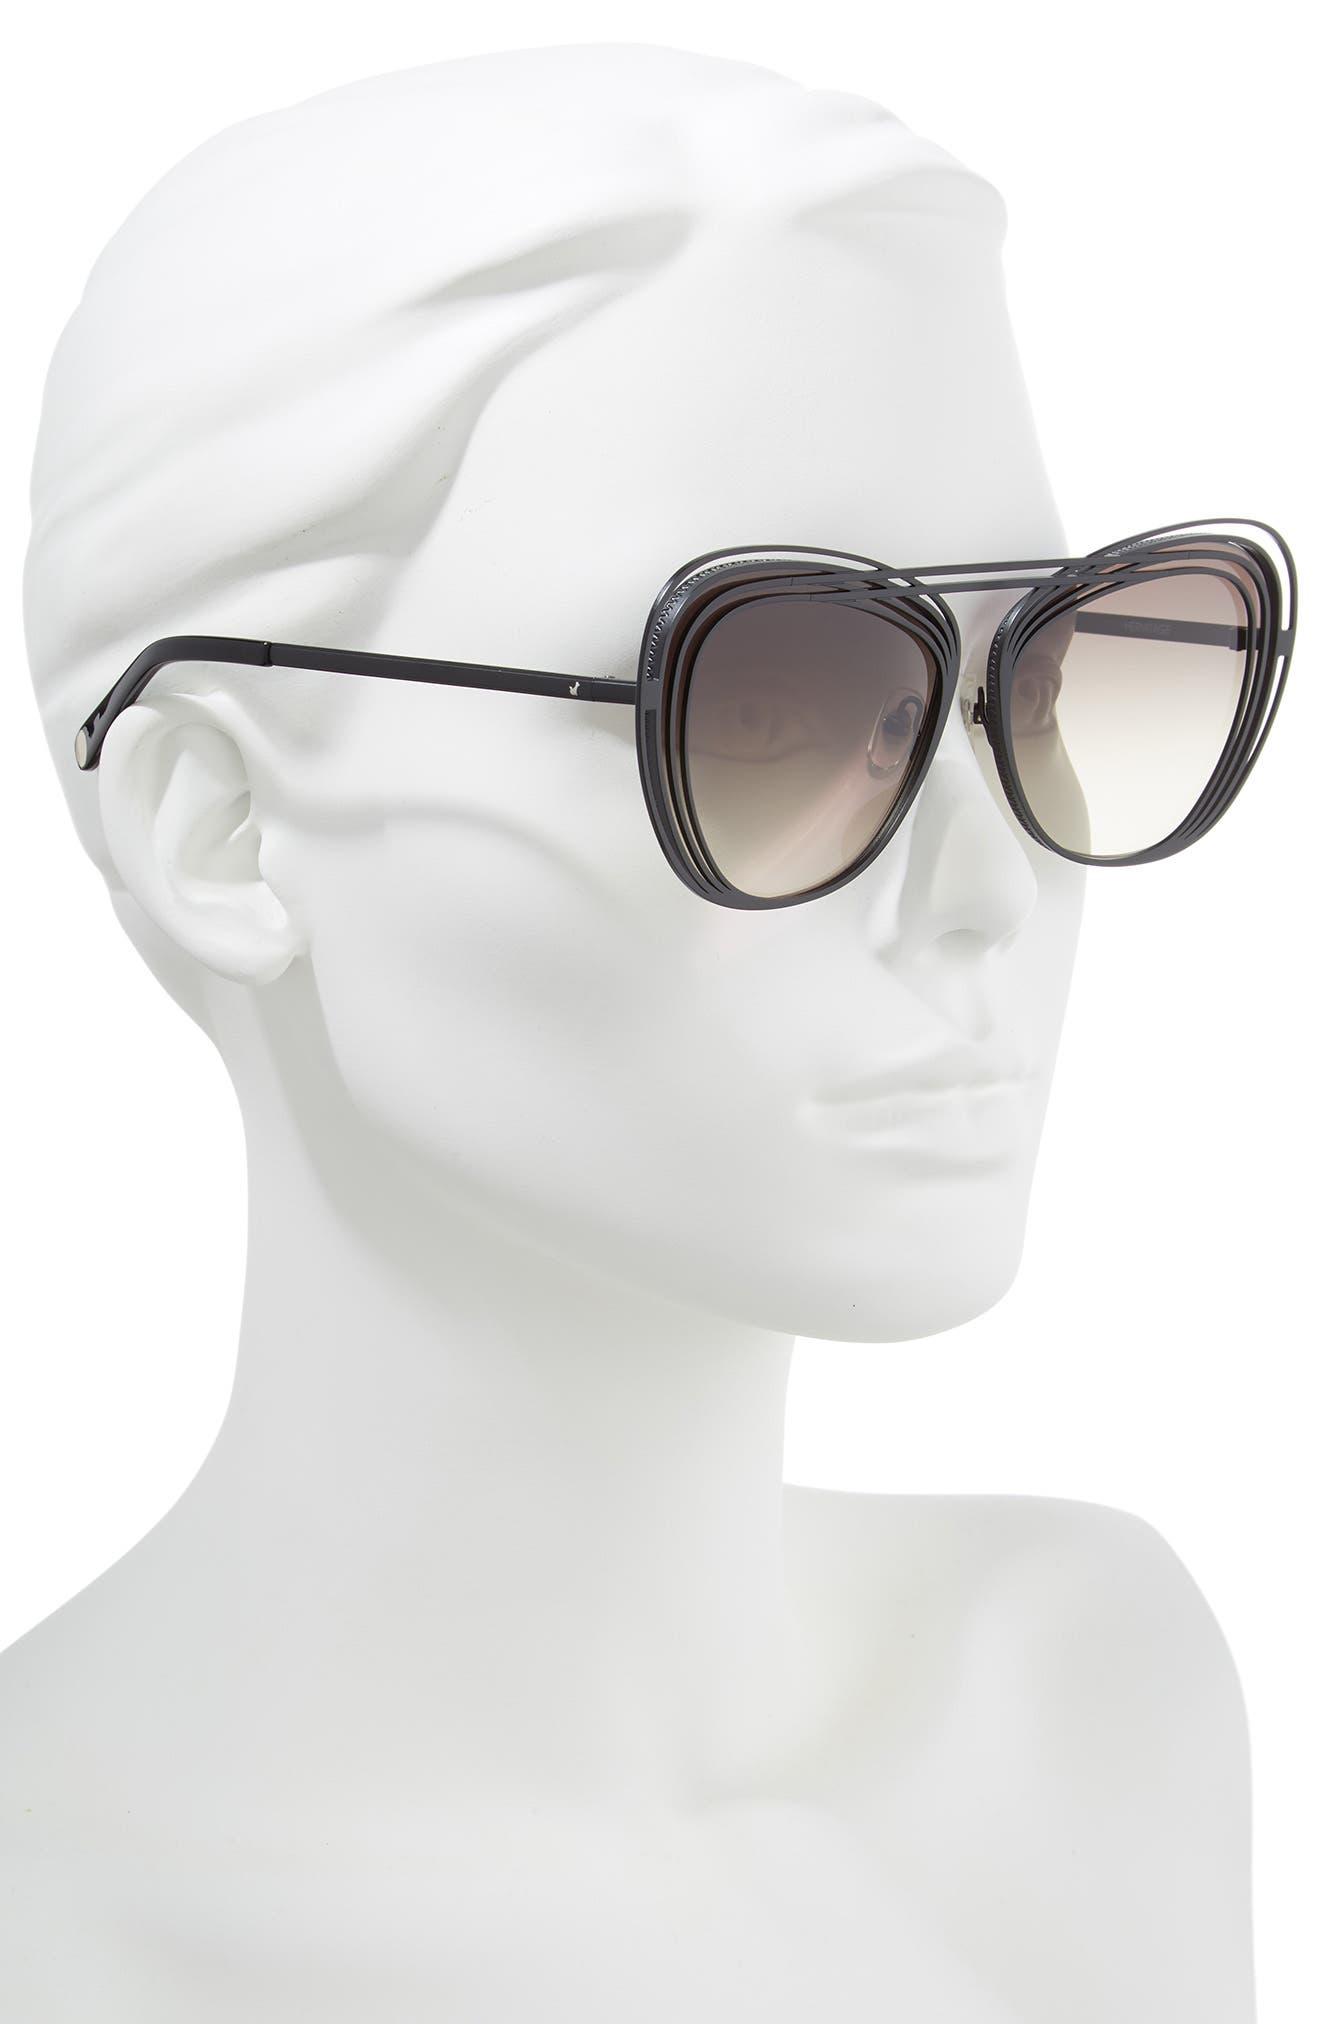 Hermitage 61mm Cat Eye Sunglasses,                             Alternate thumbnail 2, color,                             MATTE BLACK/ GREY GRADIENT